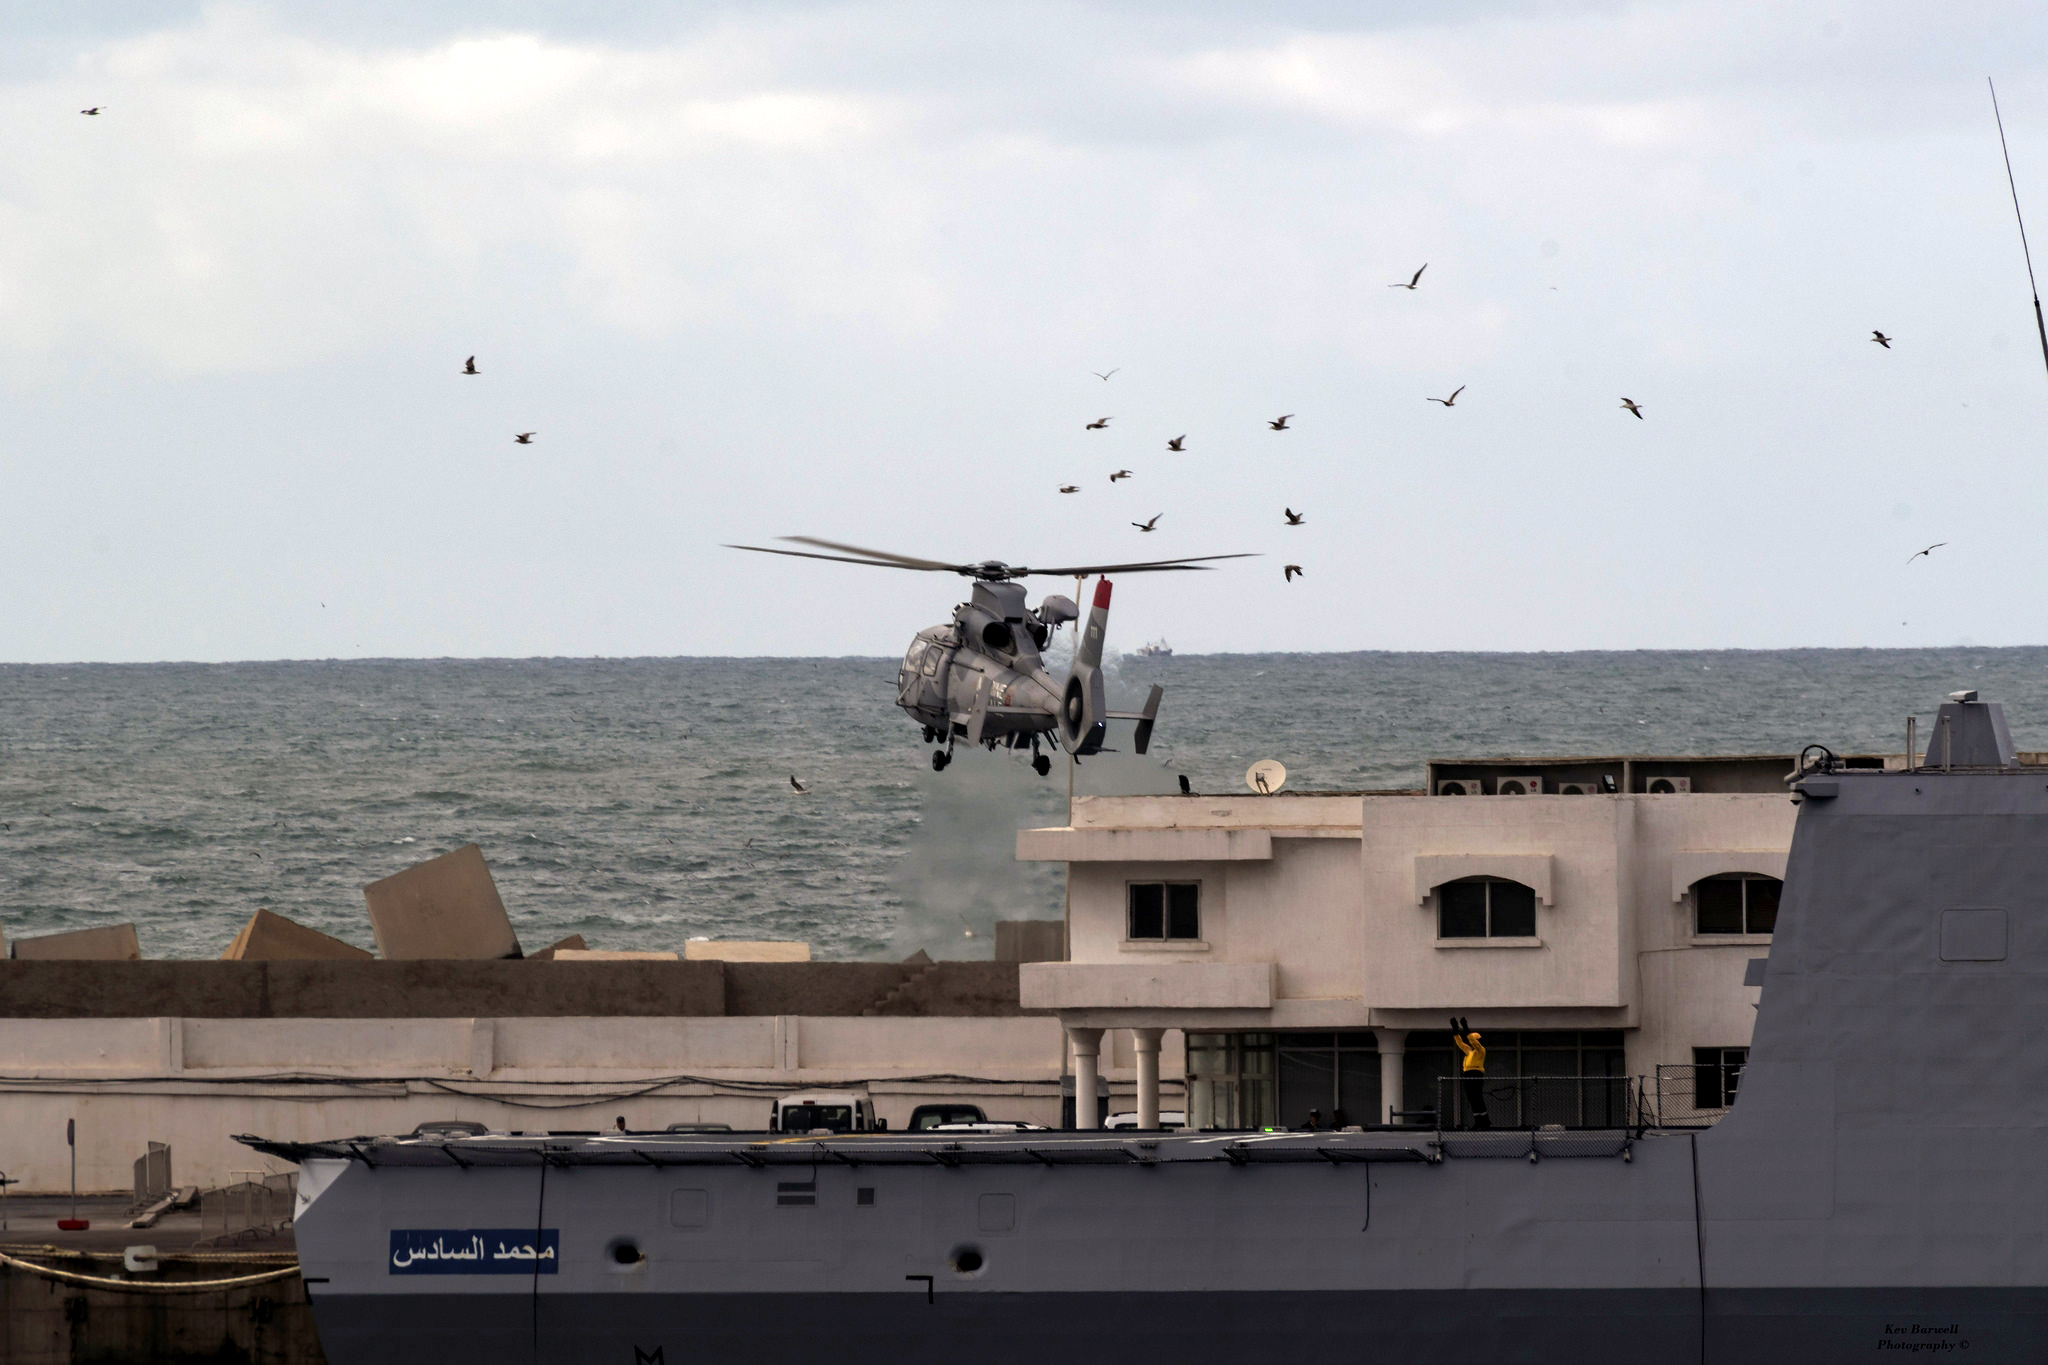 Photos Helicopteres de la MR - Page 4 41263105341_4c187ce0f3_o